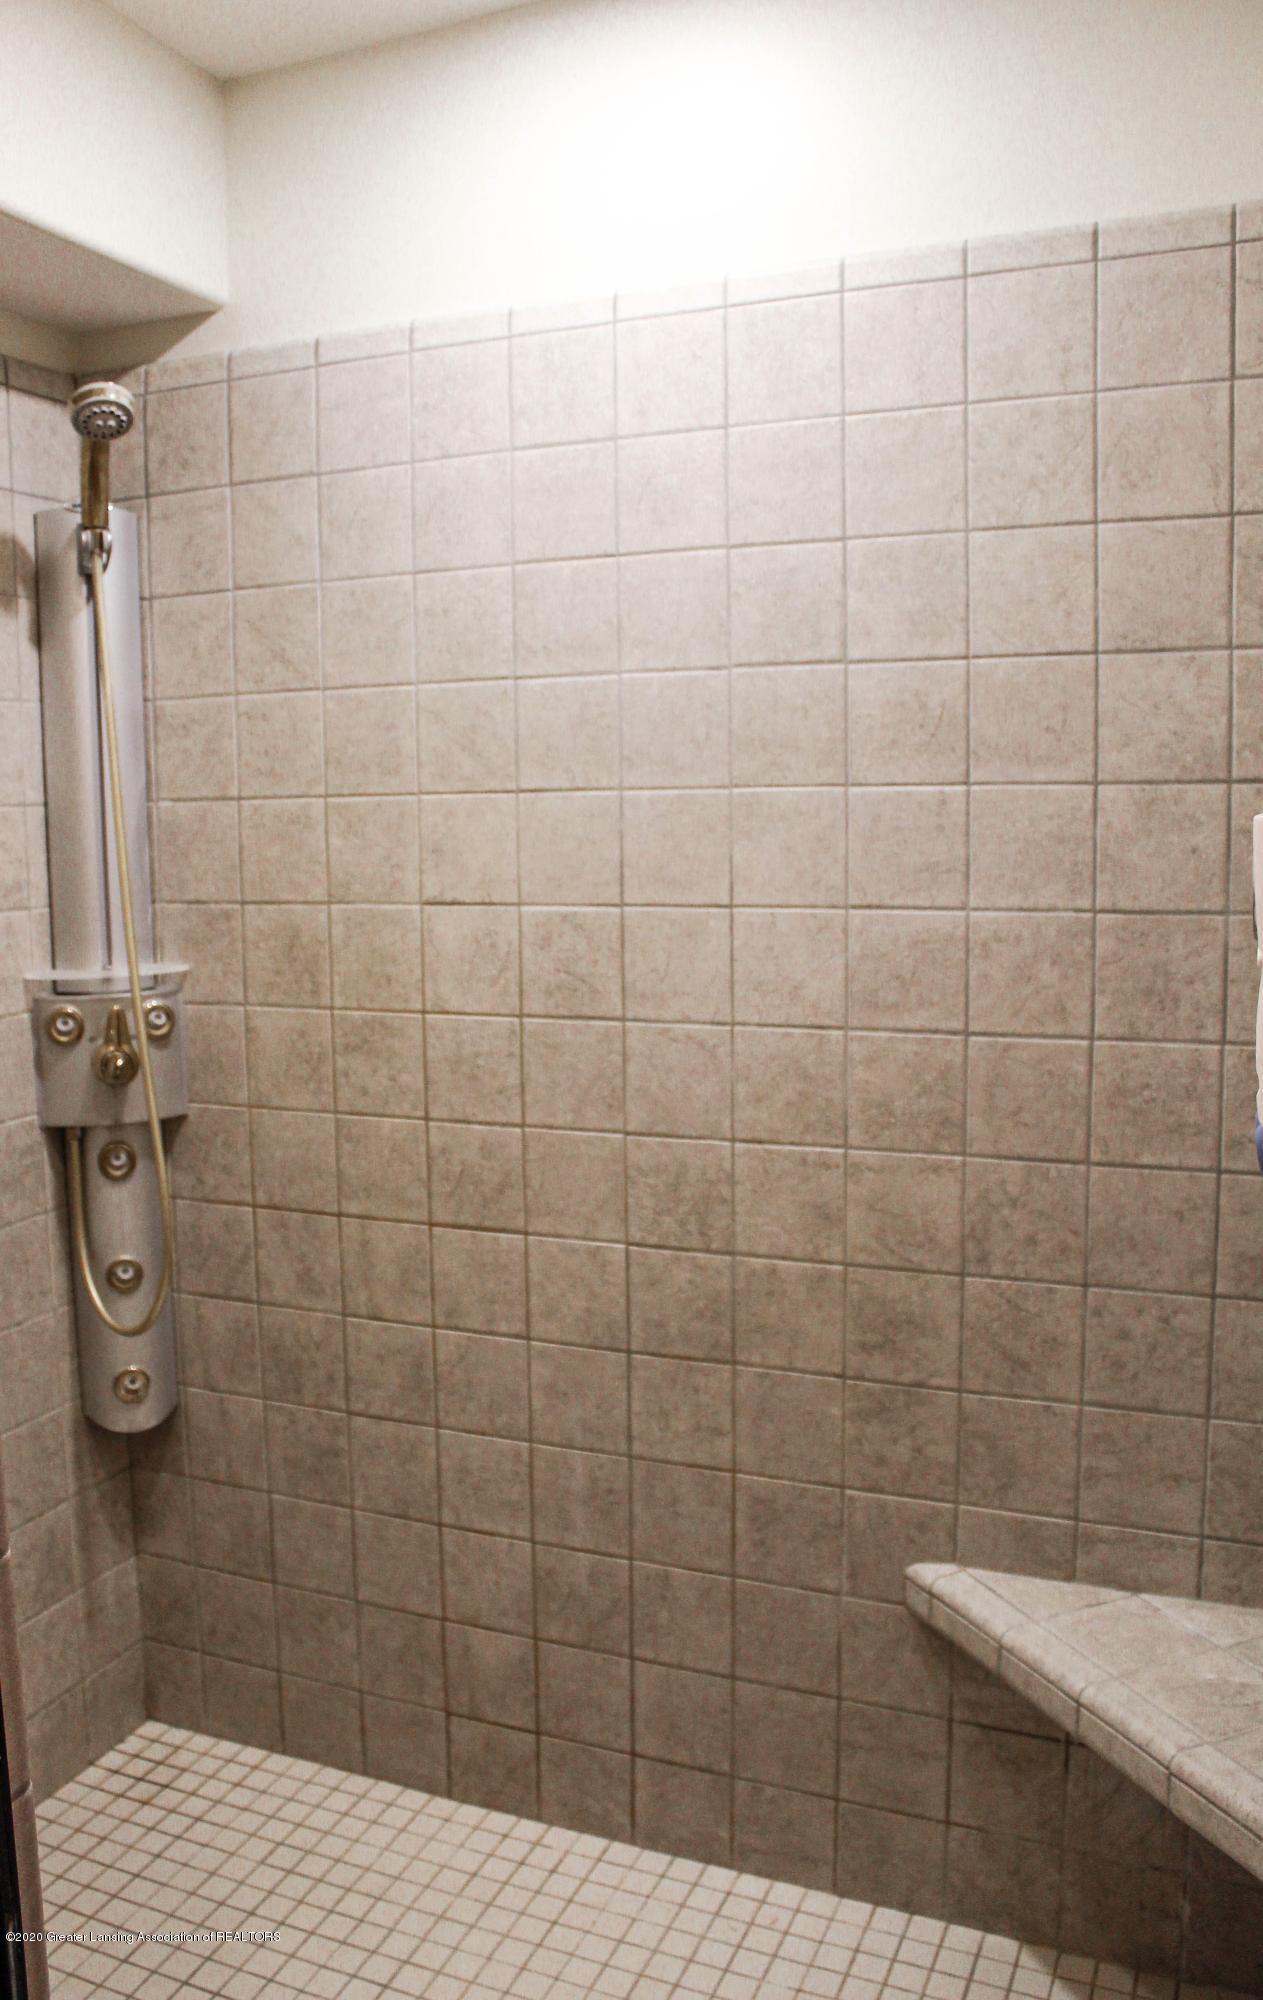 1086 Williamsburg Ct - Tiled Spa Shower - 45